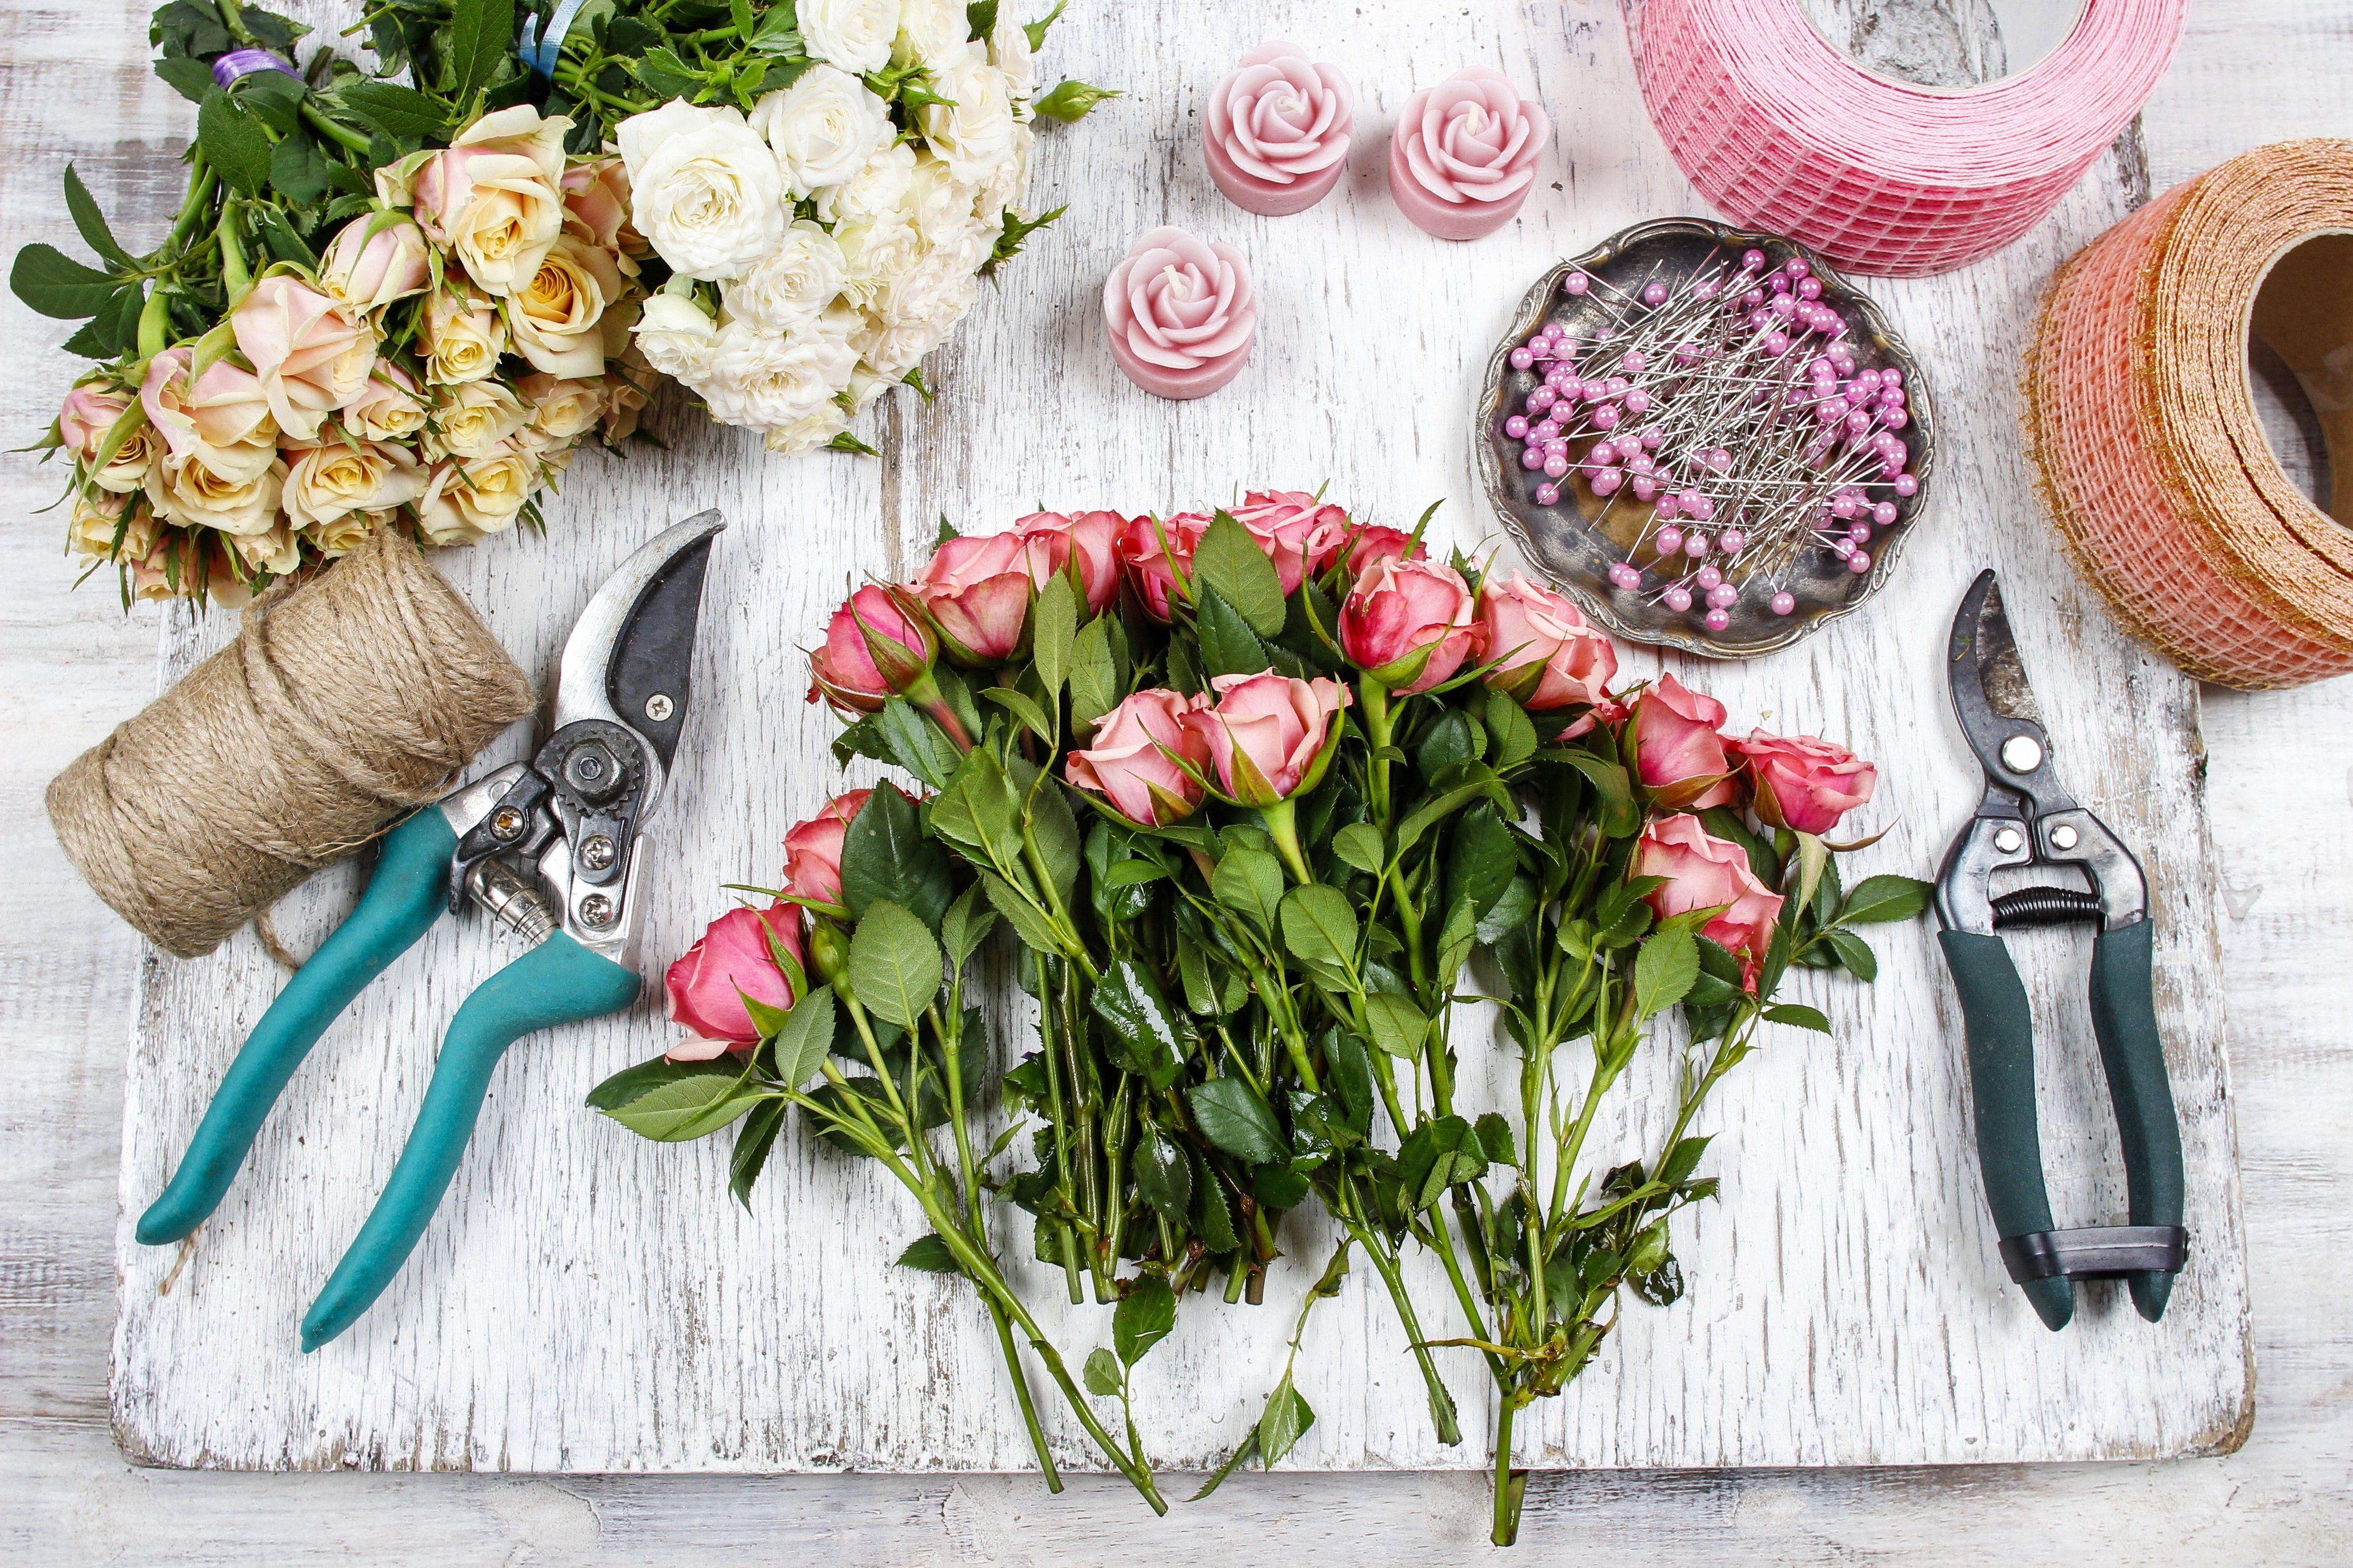 Funeral Arrangements Cheap Flowers Near Me Florist